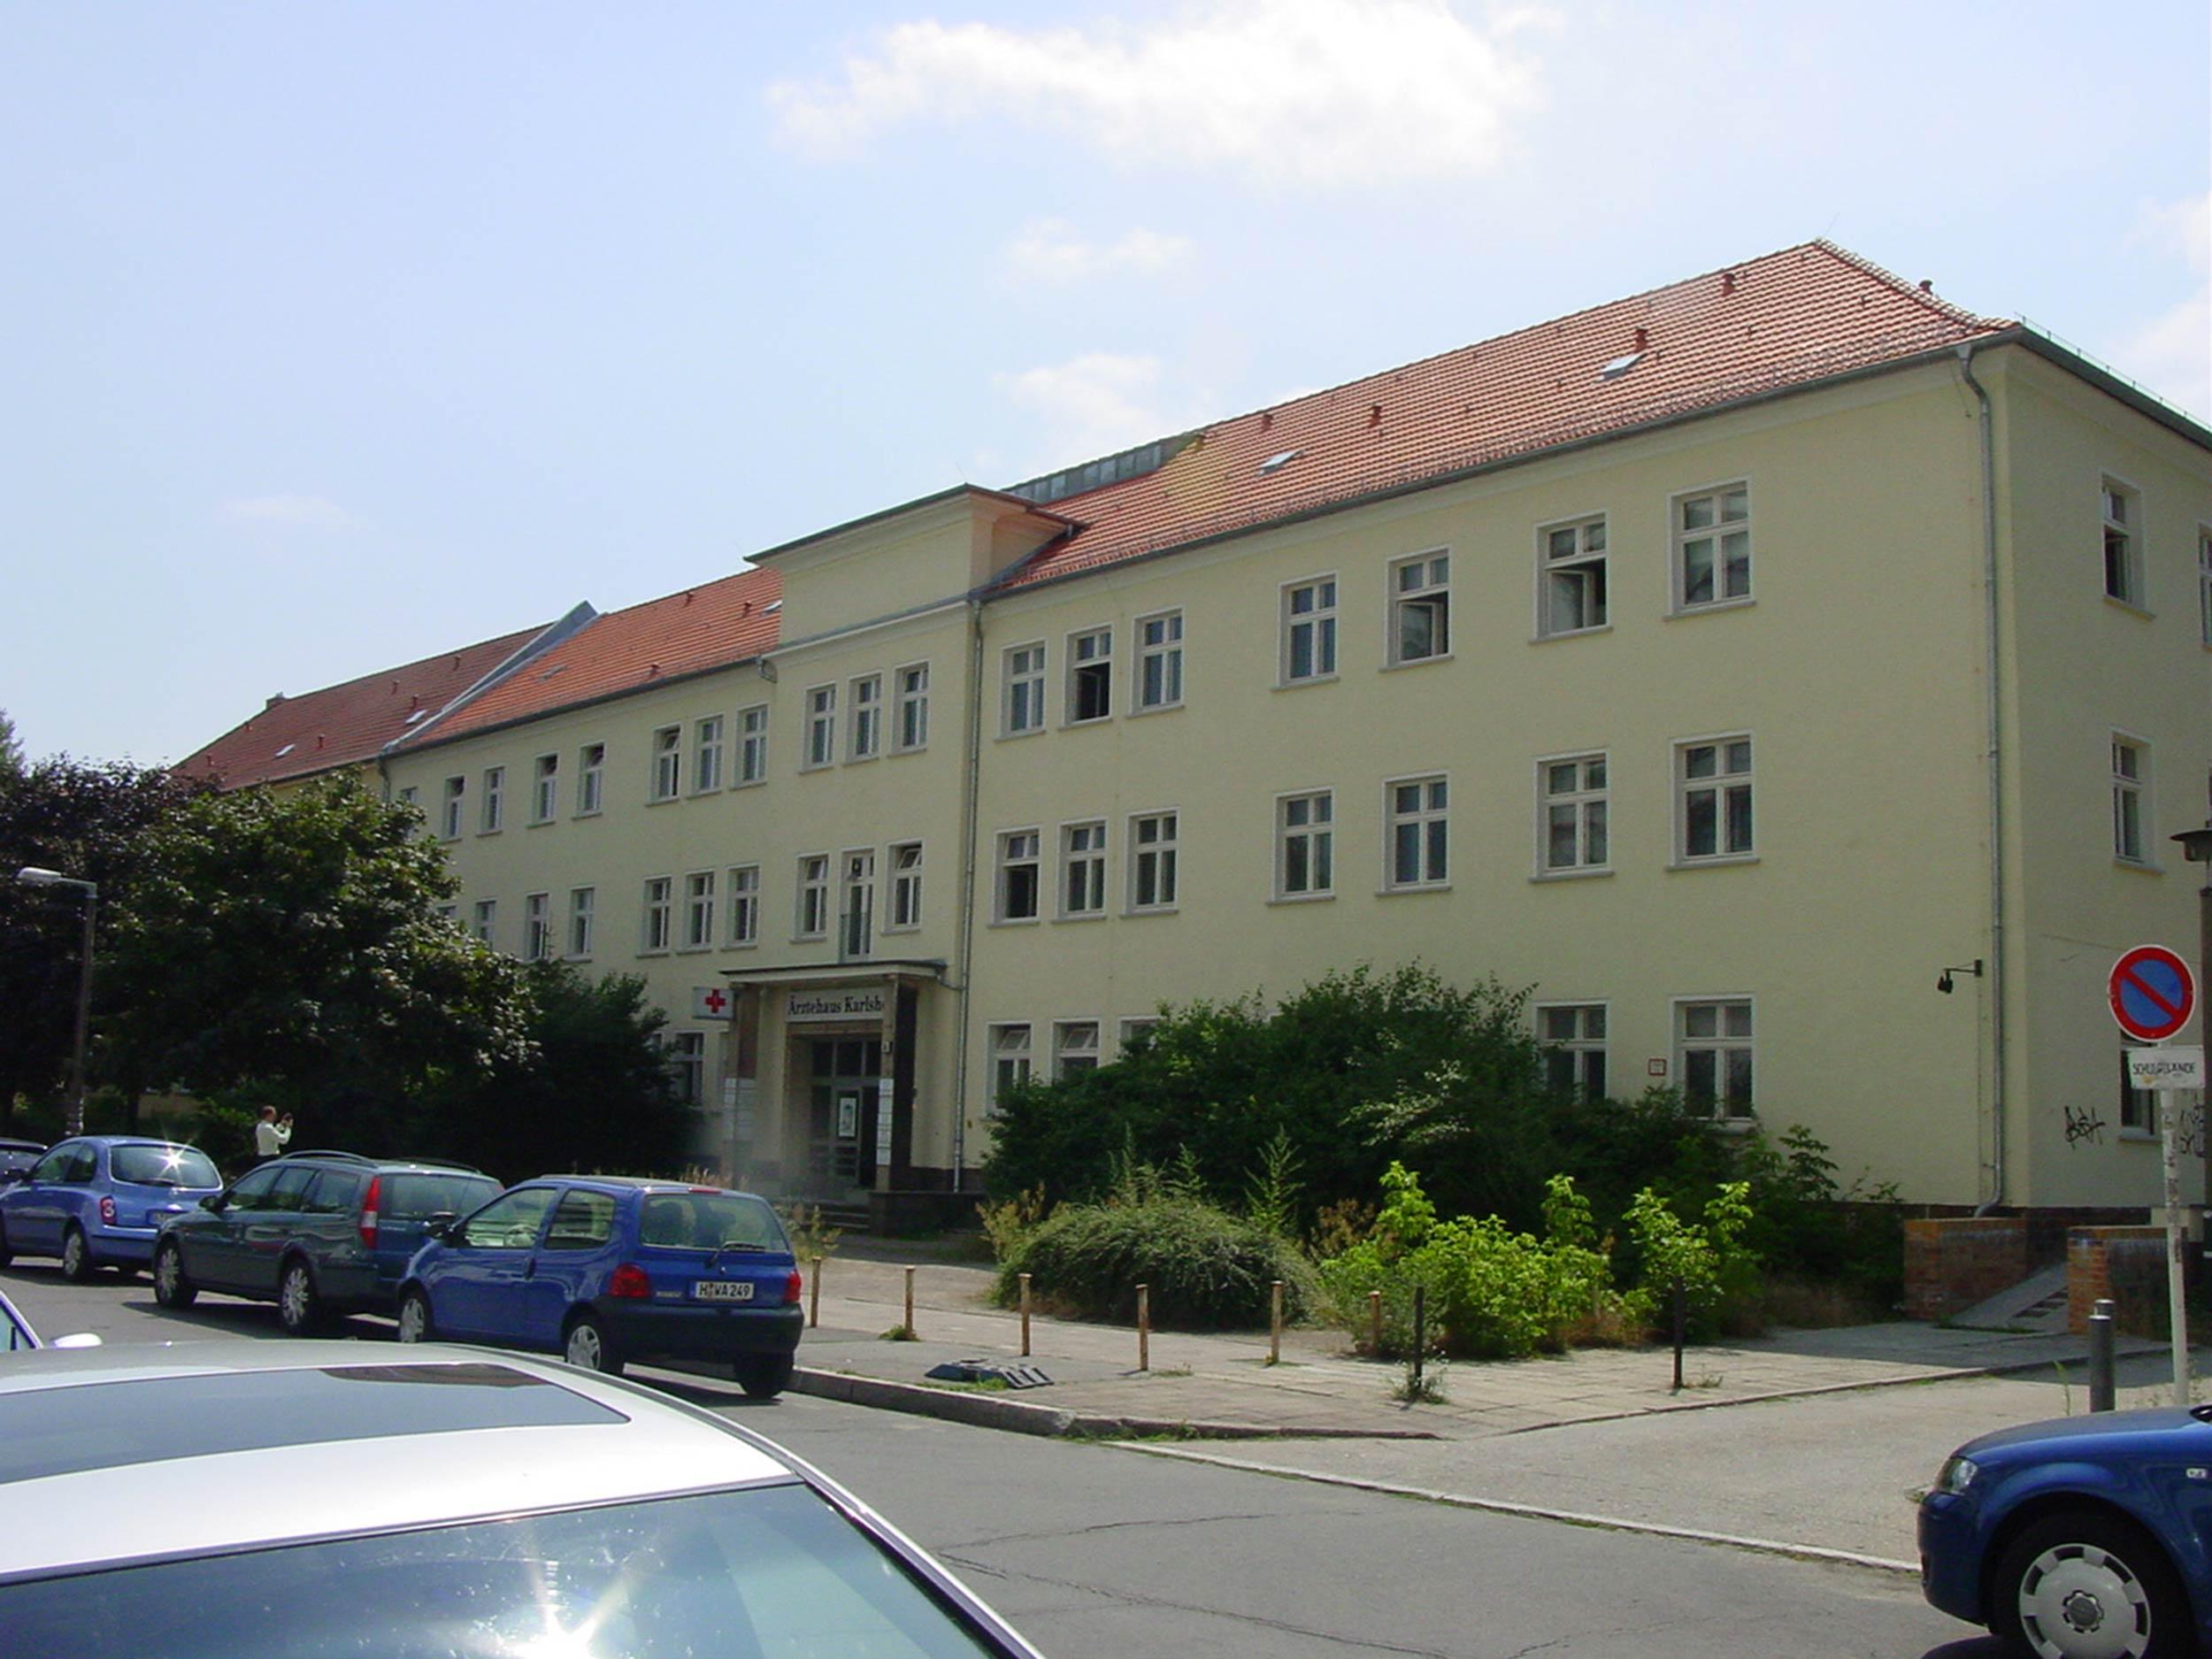 Ärztehaus Römerweg 36 Berlin.jpg